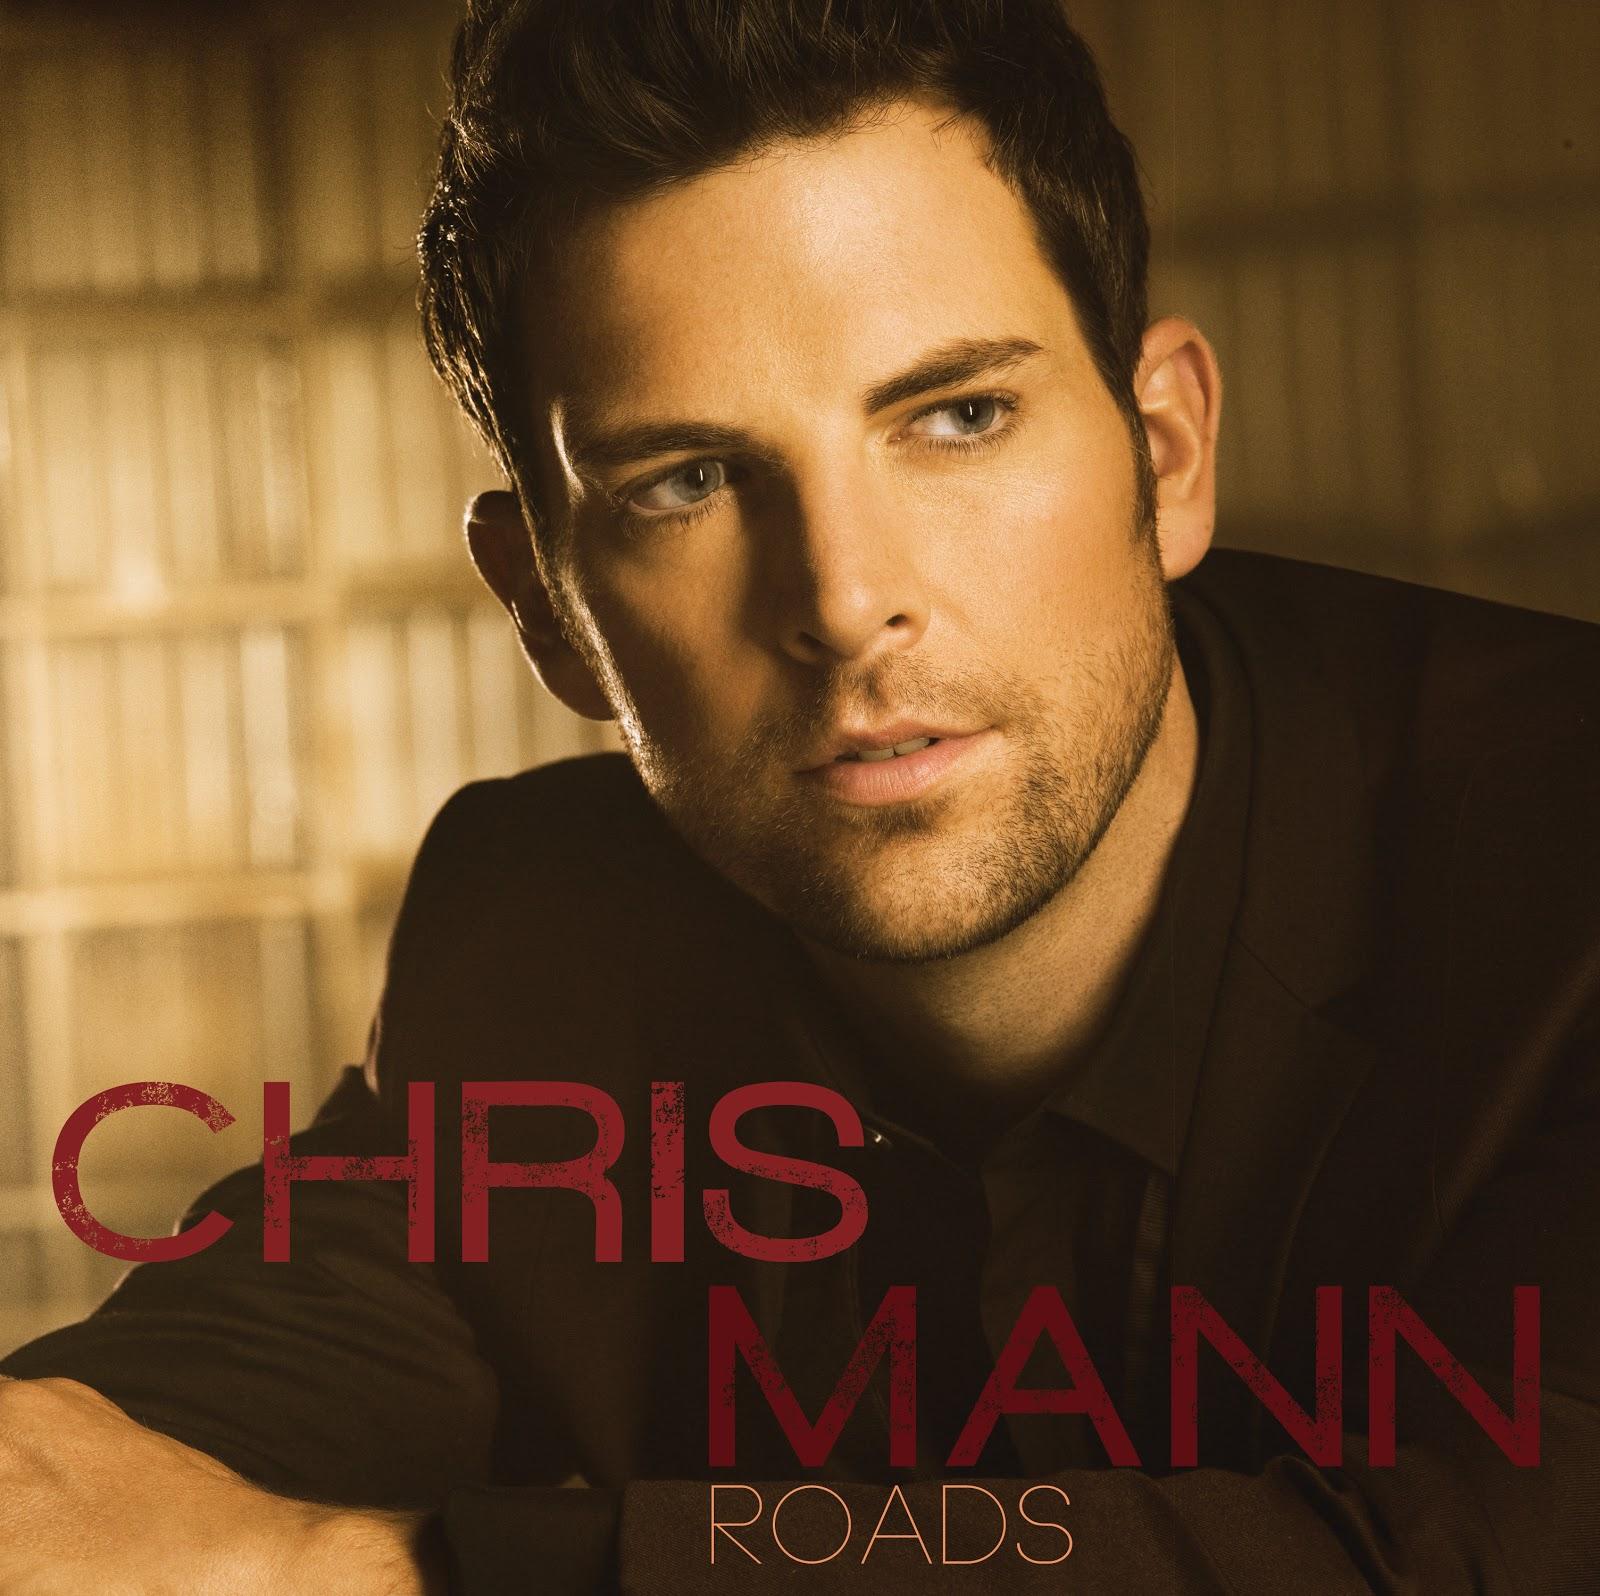 Chris mann new single